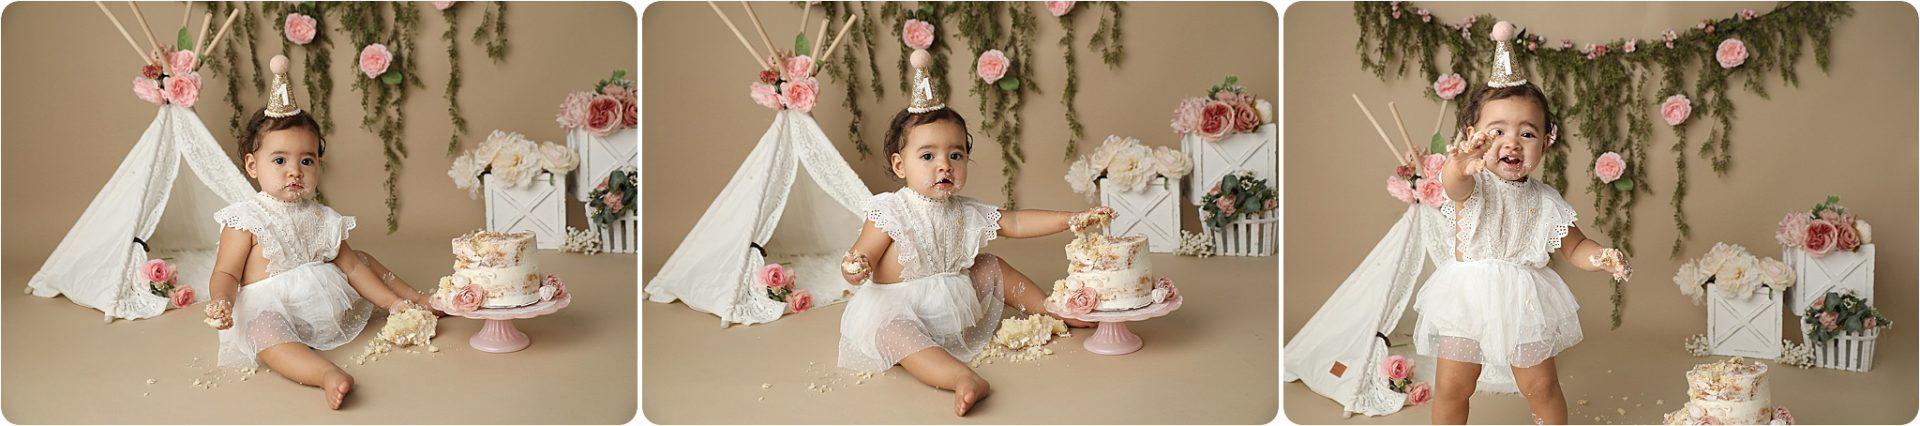 TUcson Cake Smash Baby Pictures